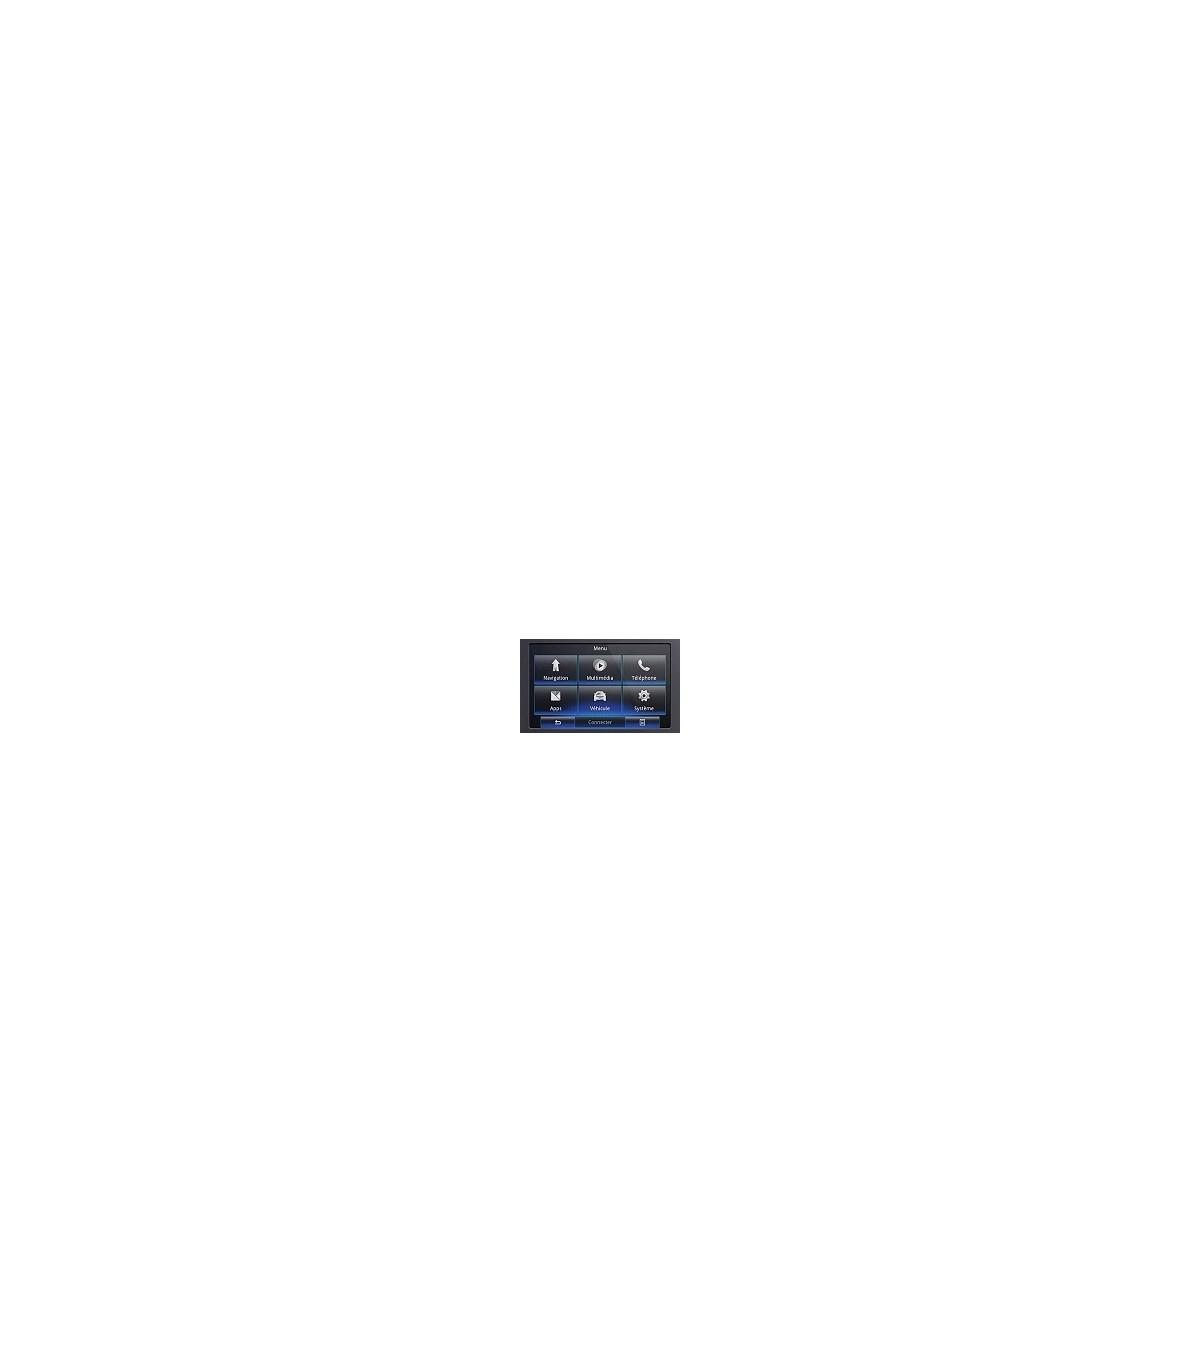 Interface Câmara Traseira Renault R-LINK2